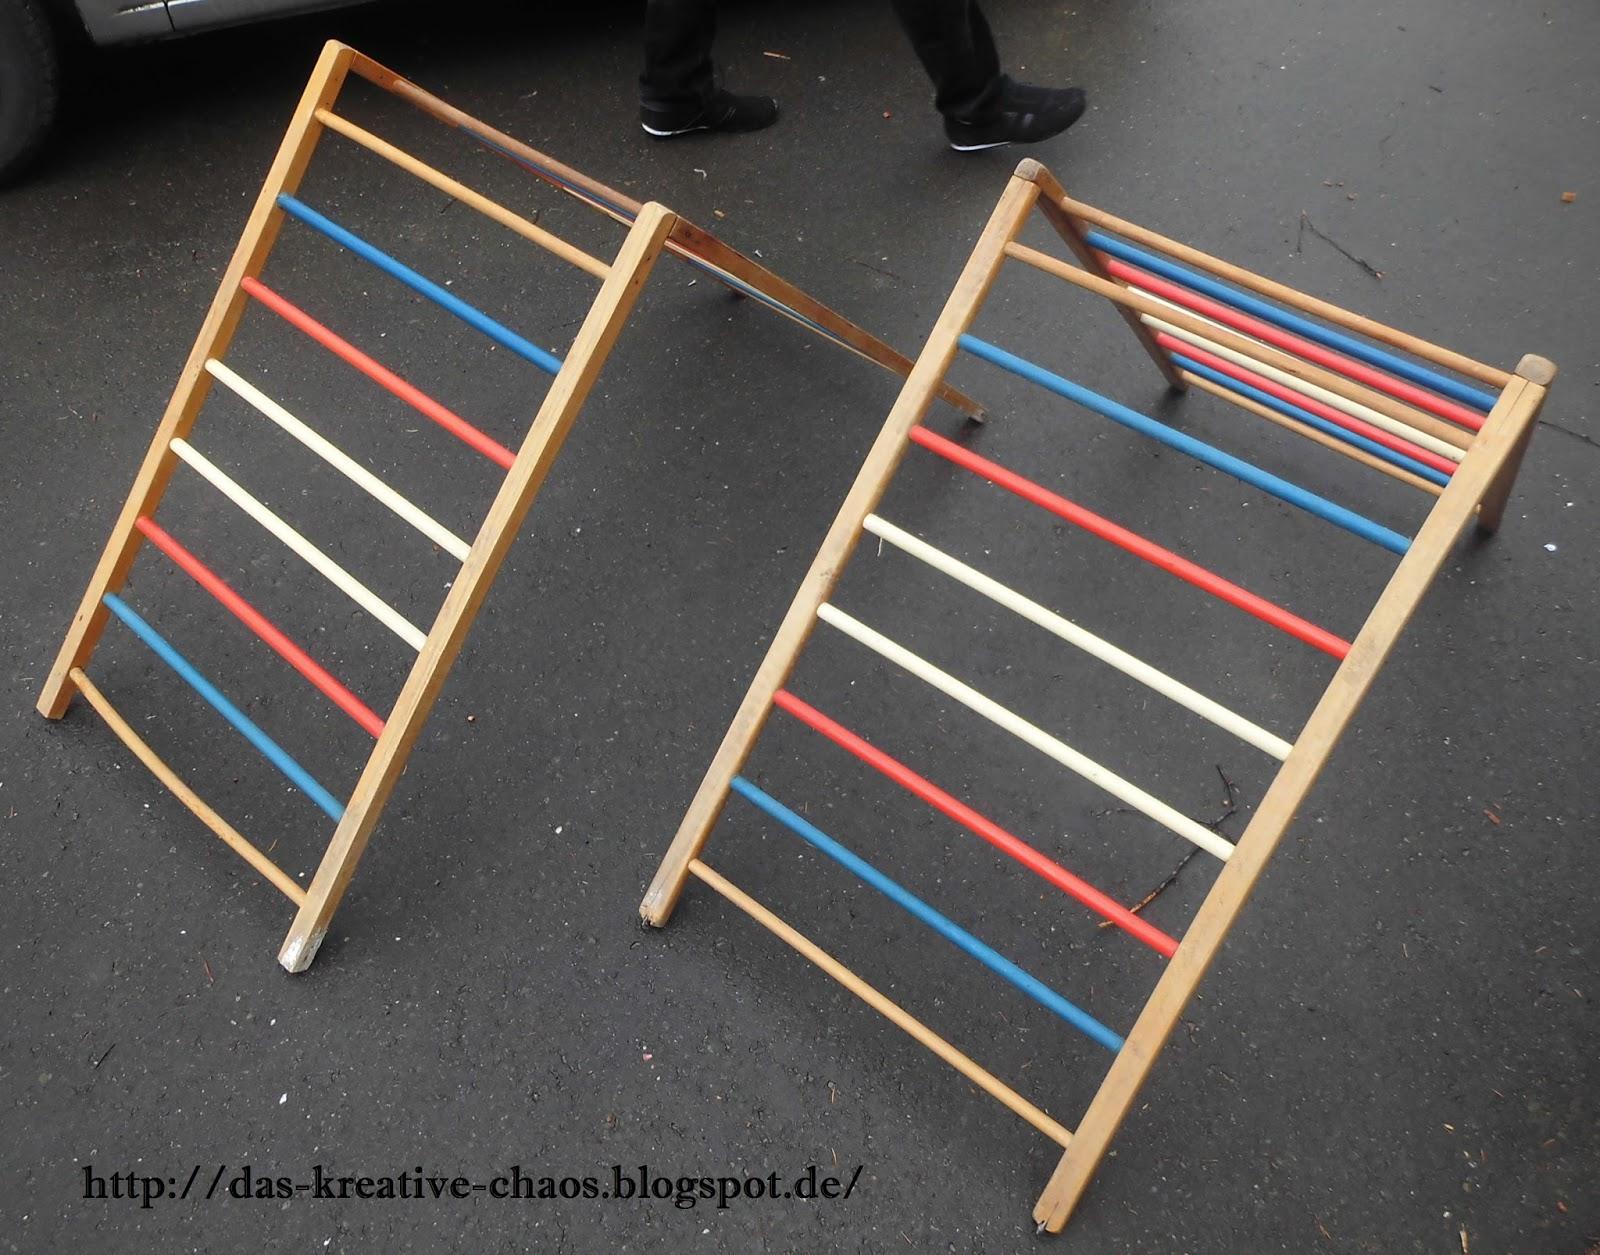 Kletterdreieck Pikler : Frau k und das kreative chaos pikler dreieck selbst gebaut